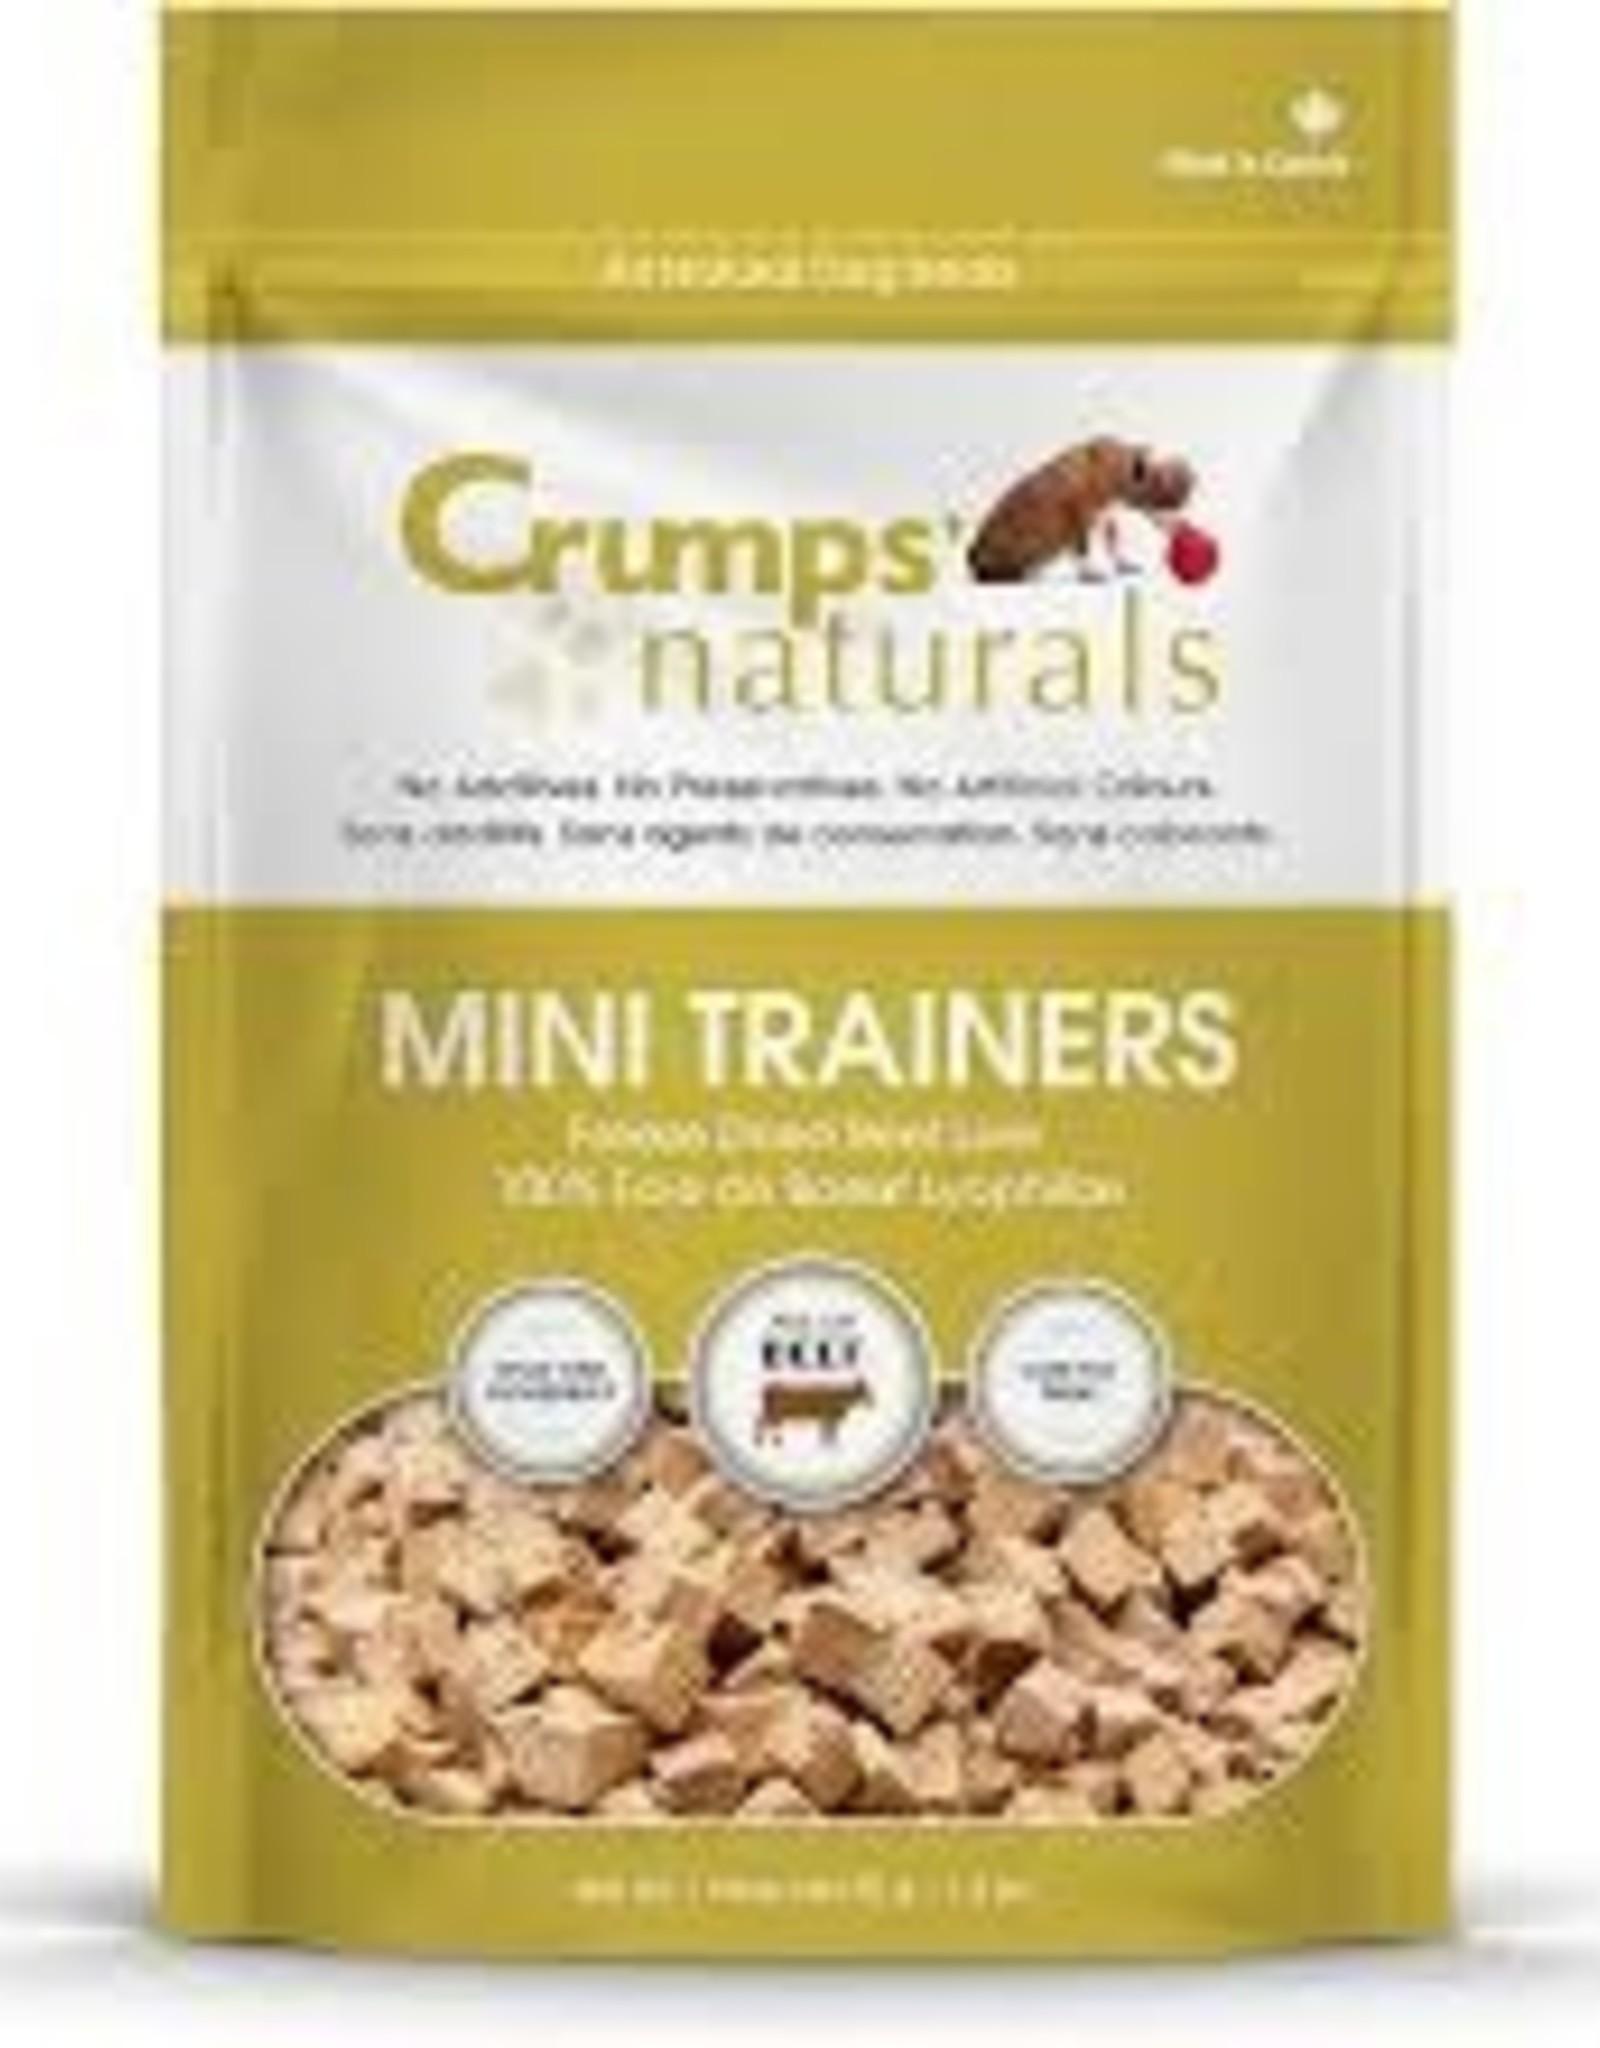 CRUMPS Mini Trainers Beef Liver 1.8 oz